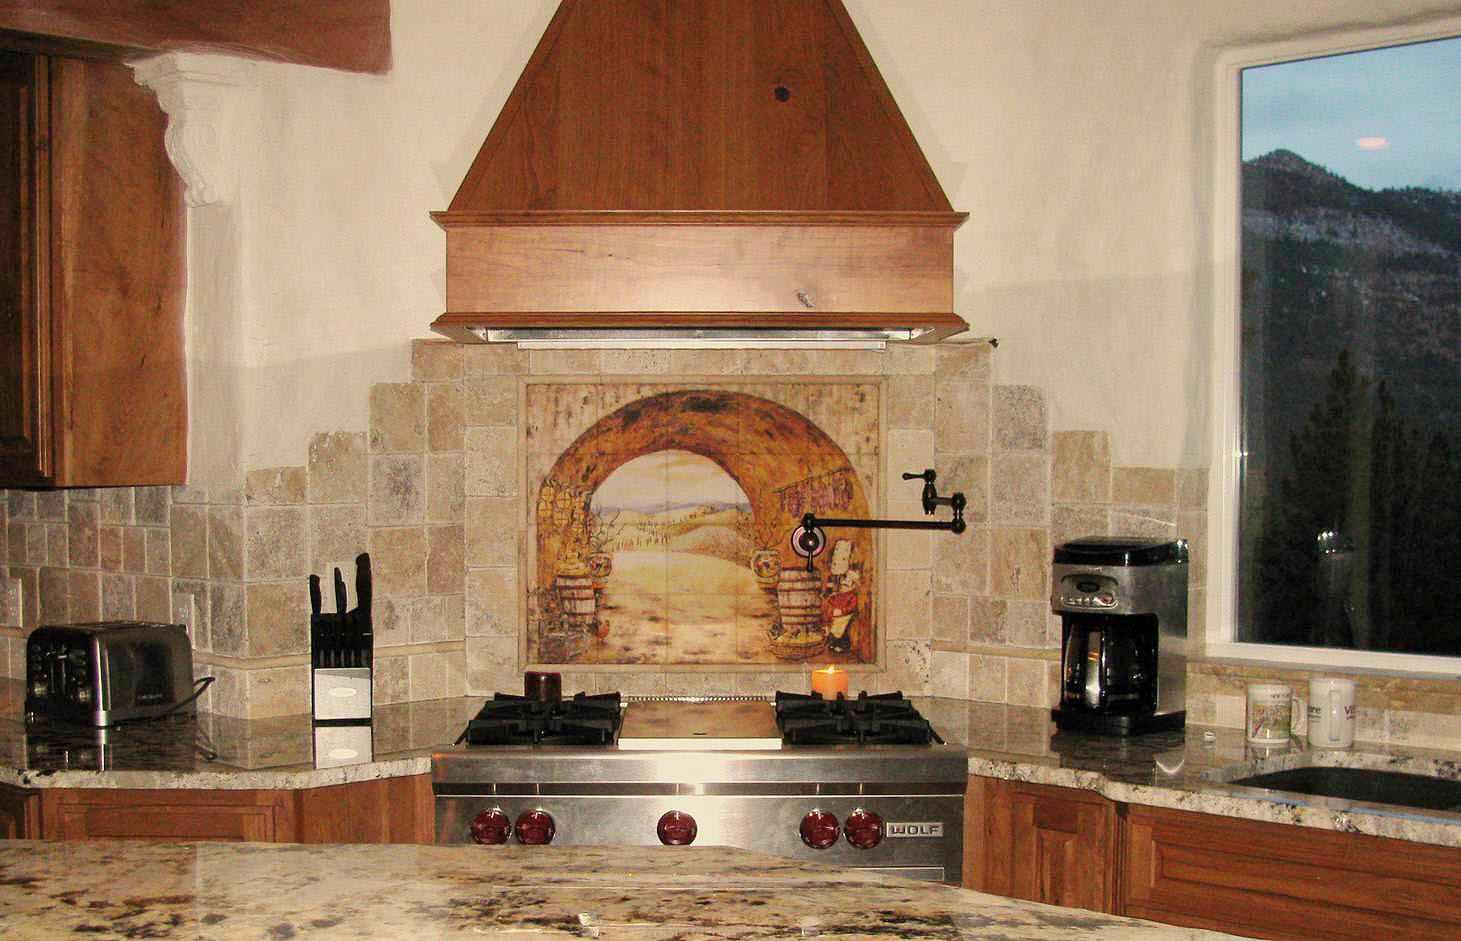 Backsplash Design Ideas for Your Kitchen on Granite Stove Backsplash  id=22640